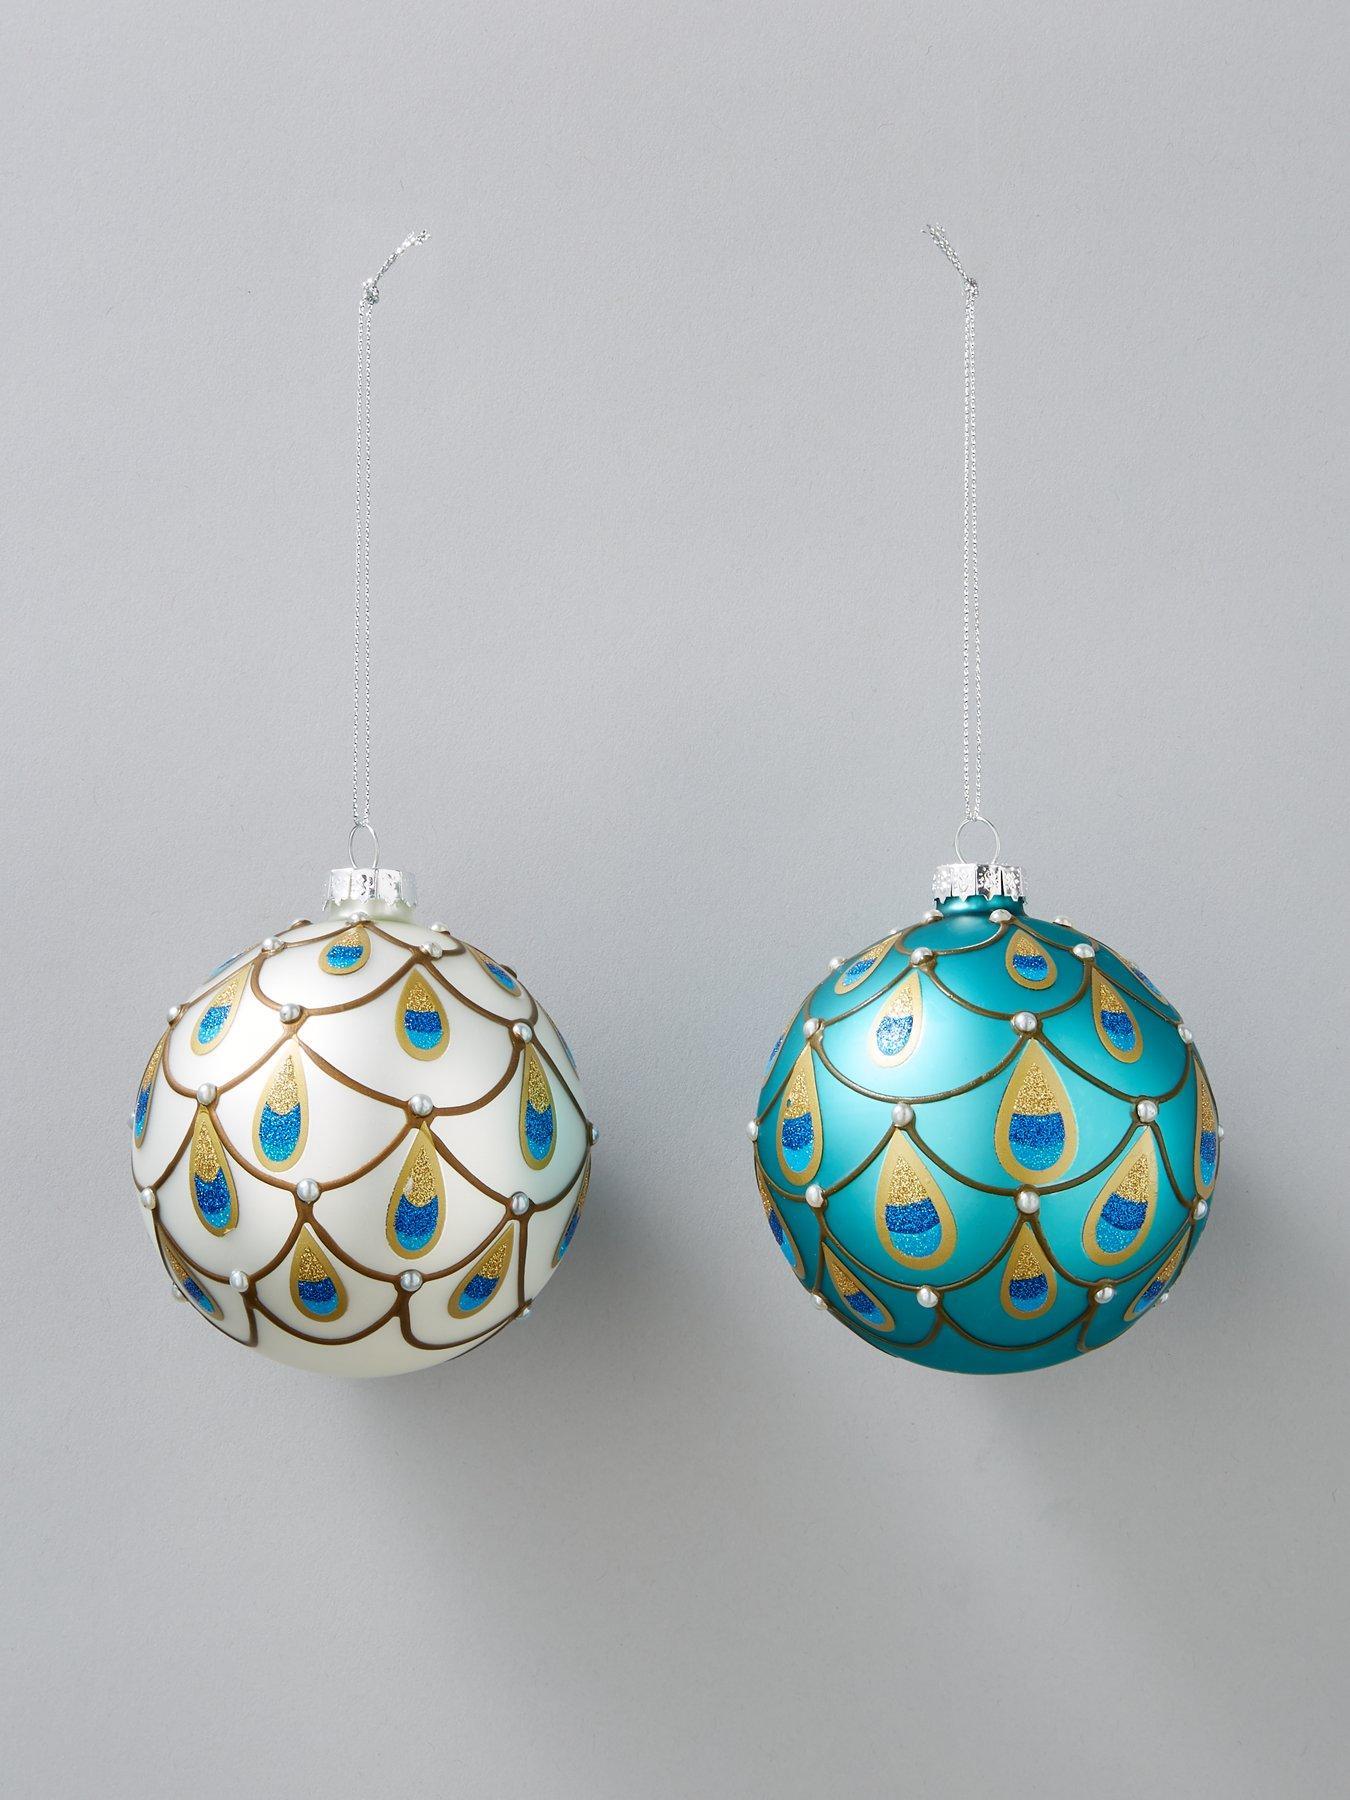 51 Pack Luxury Baubles Value Bag Decor Balls Sparkle Christmas Tree BRAND NEW